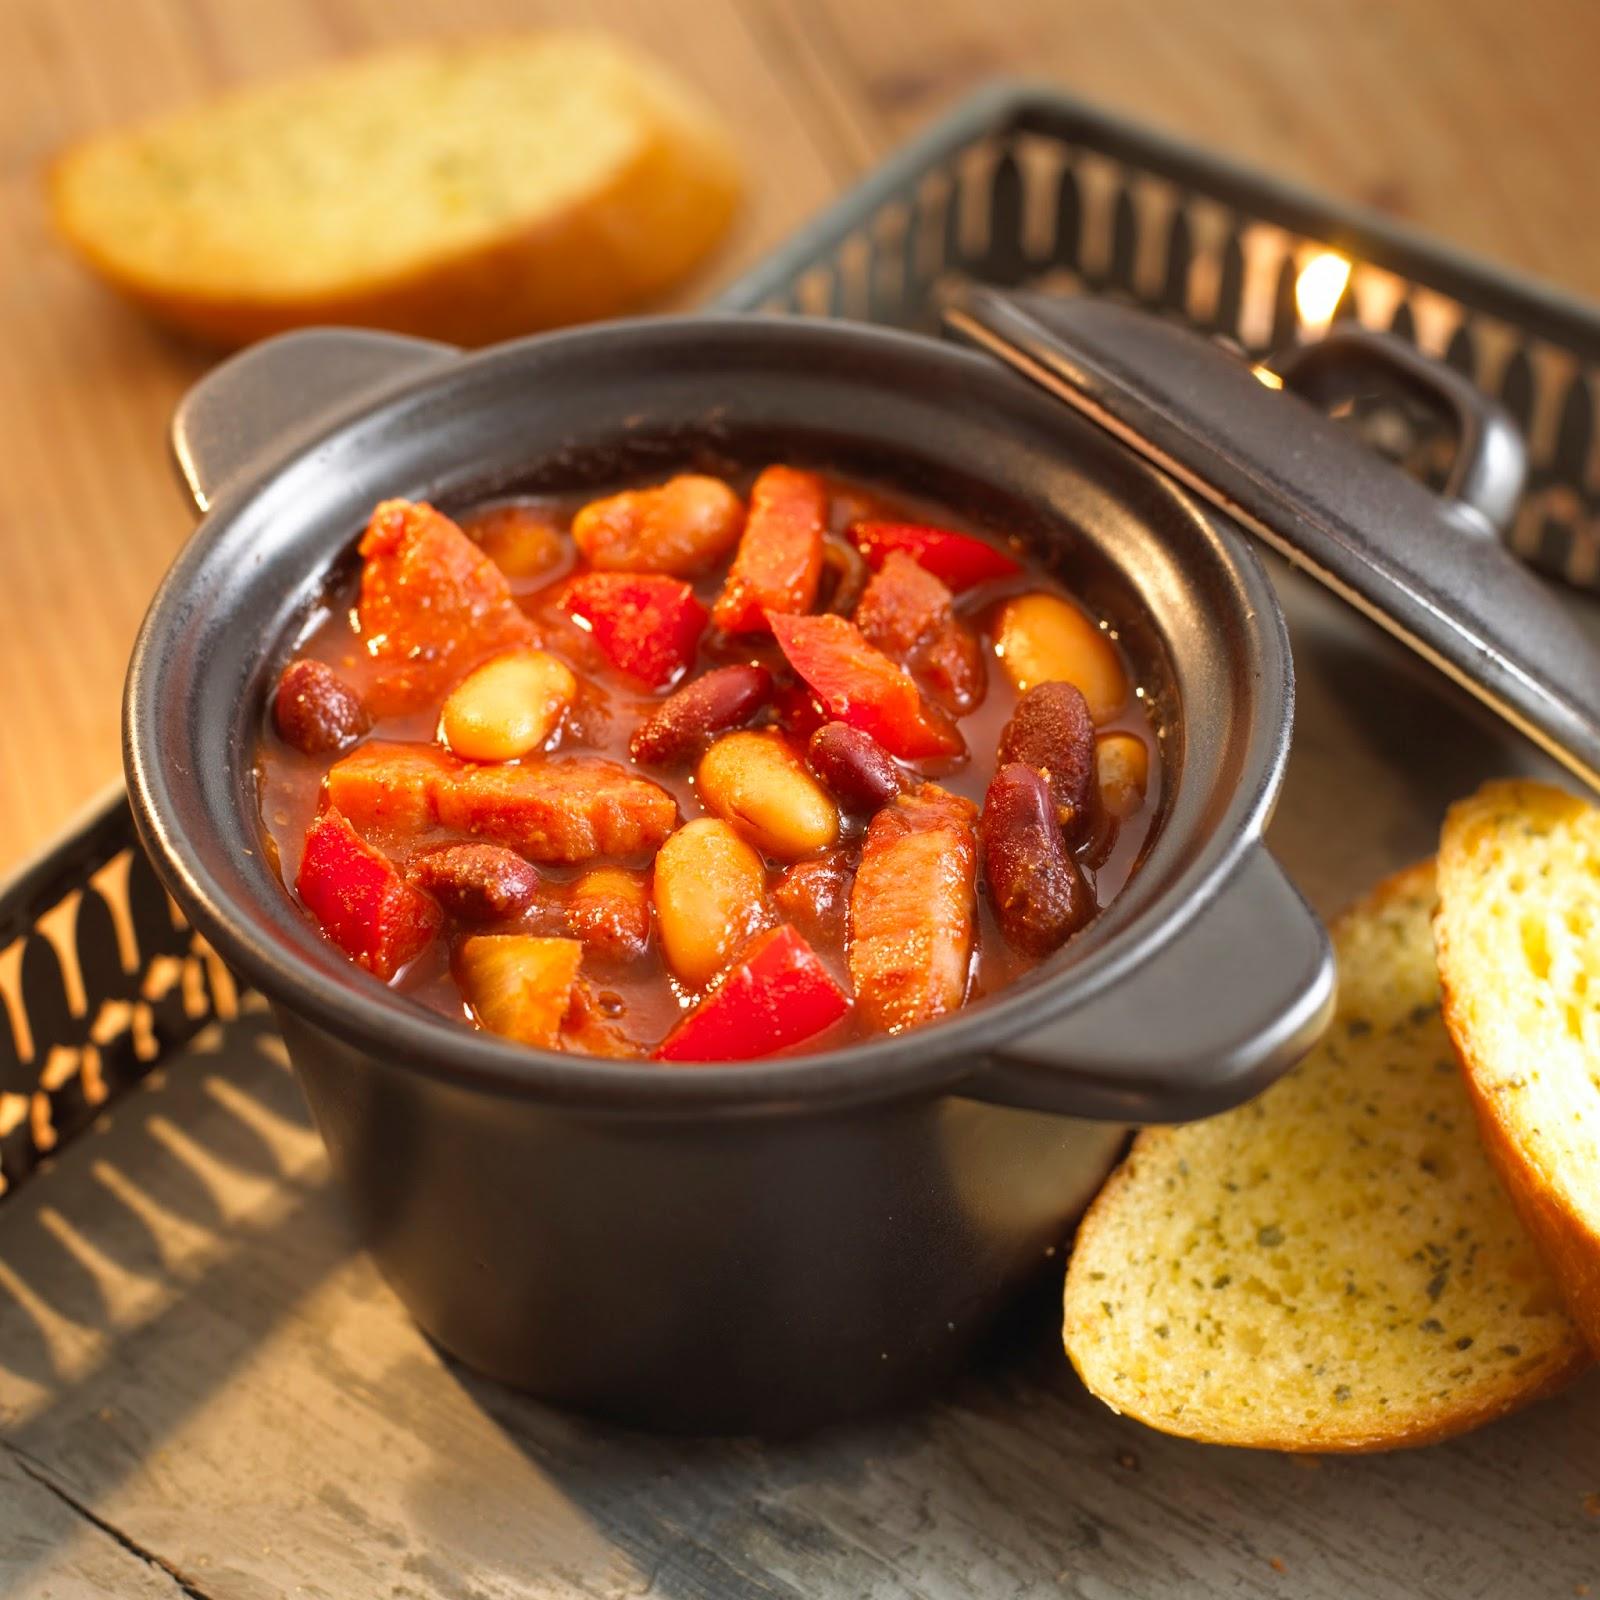 Lyle's Beany Goulash: Autumn Comfort Foods